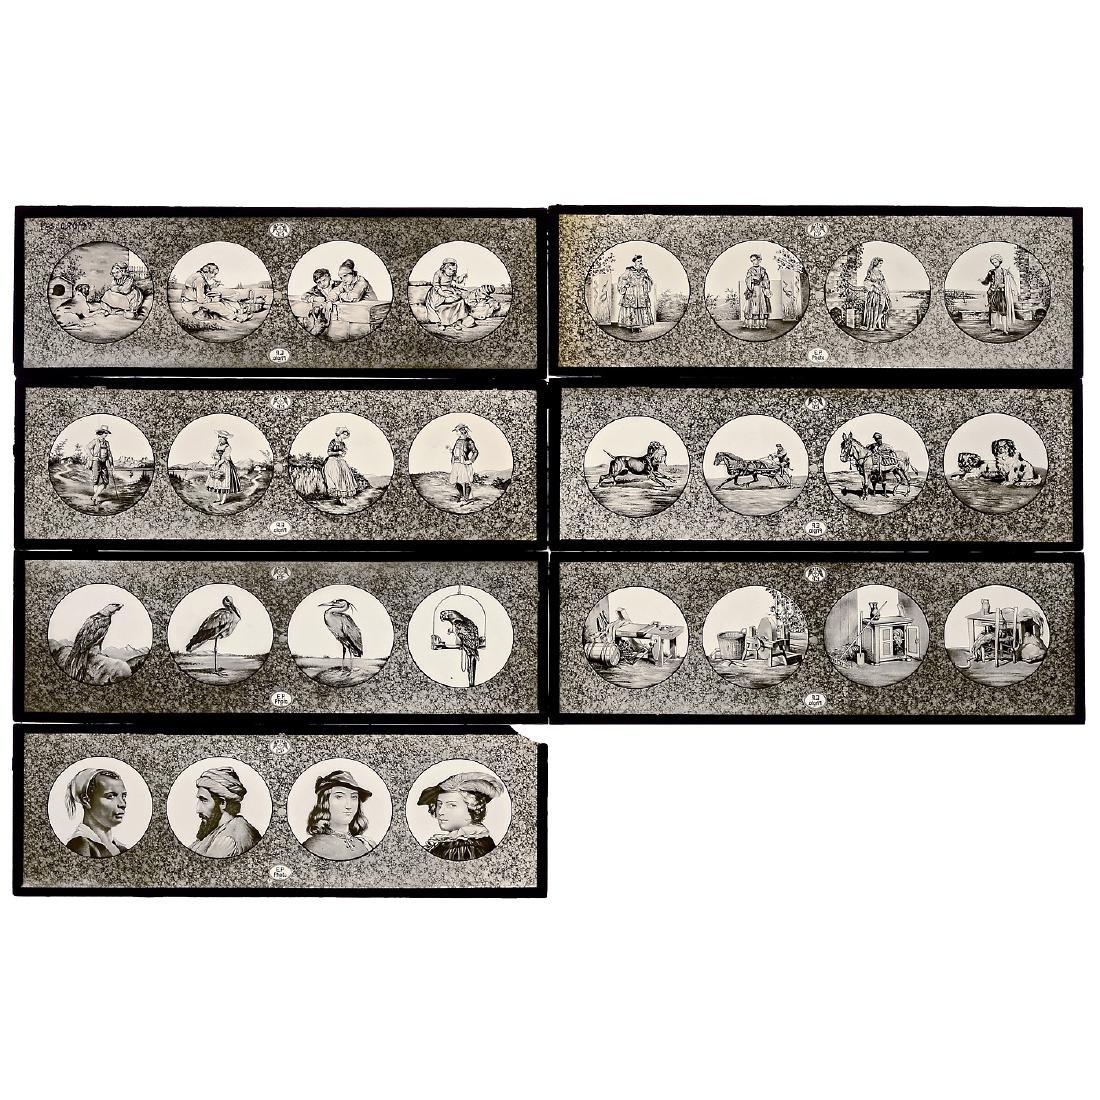 7 Photographic Lantern Slides by Plank, c. 1903